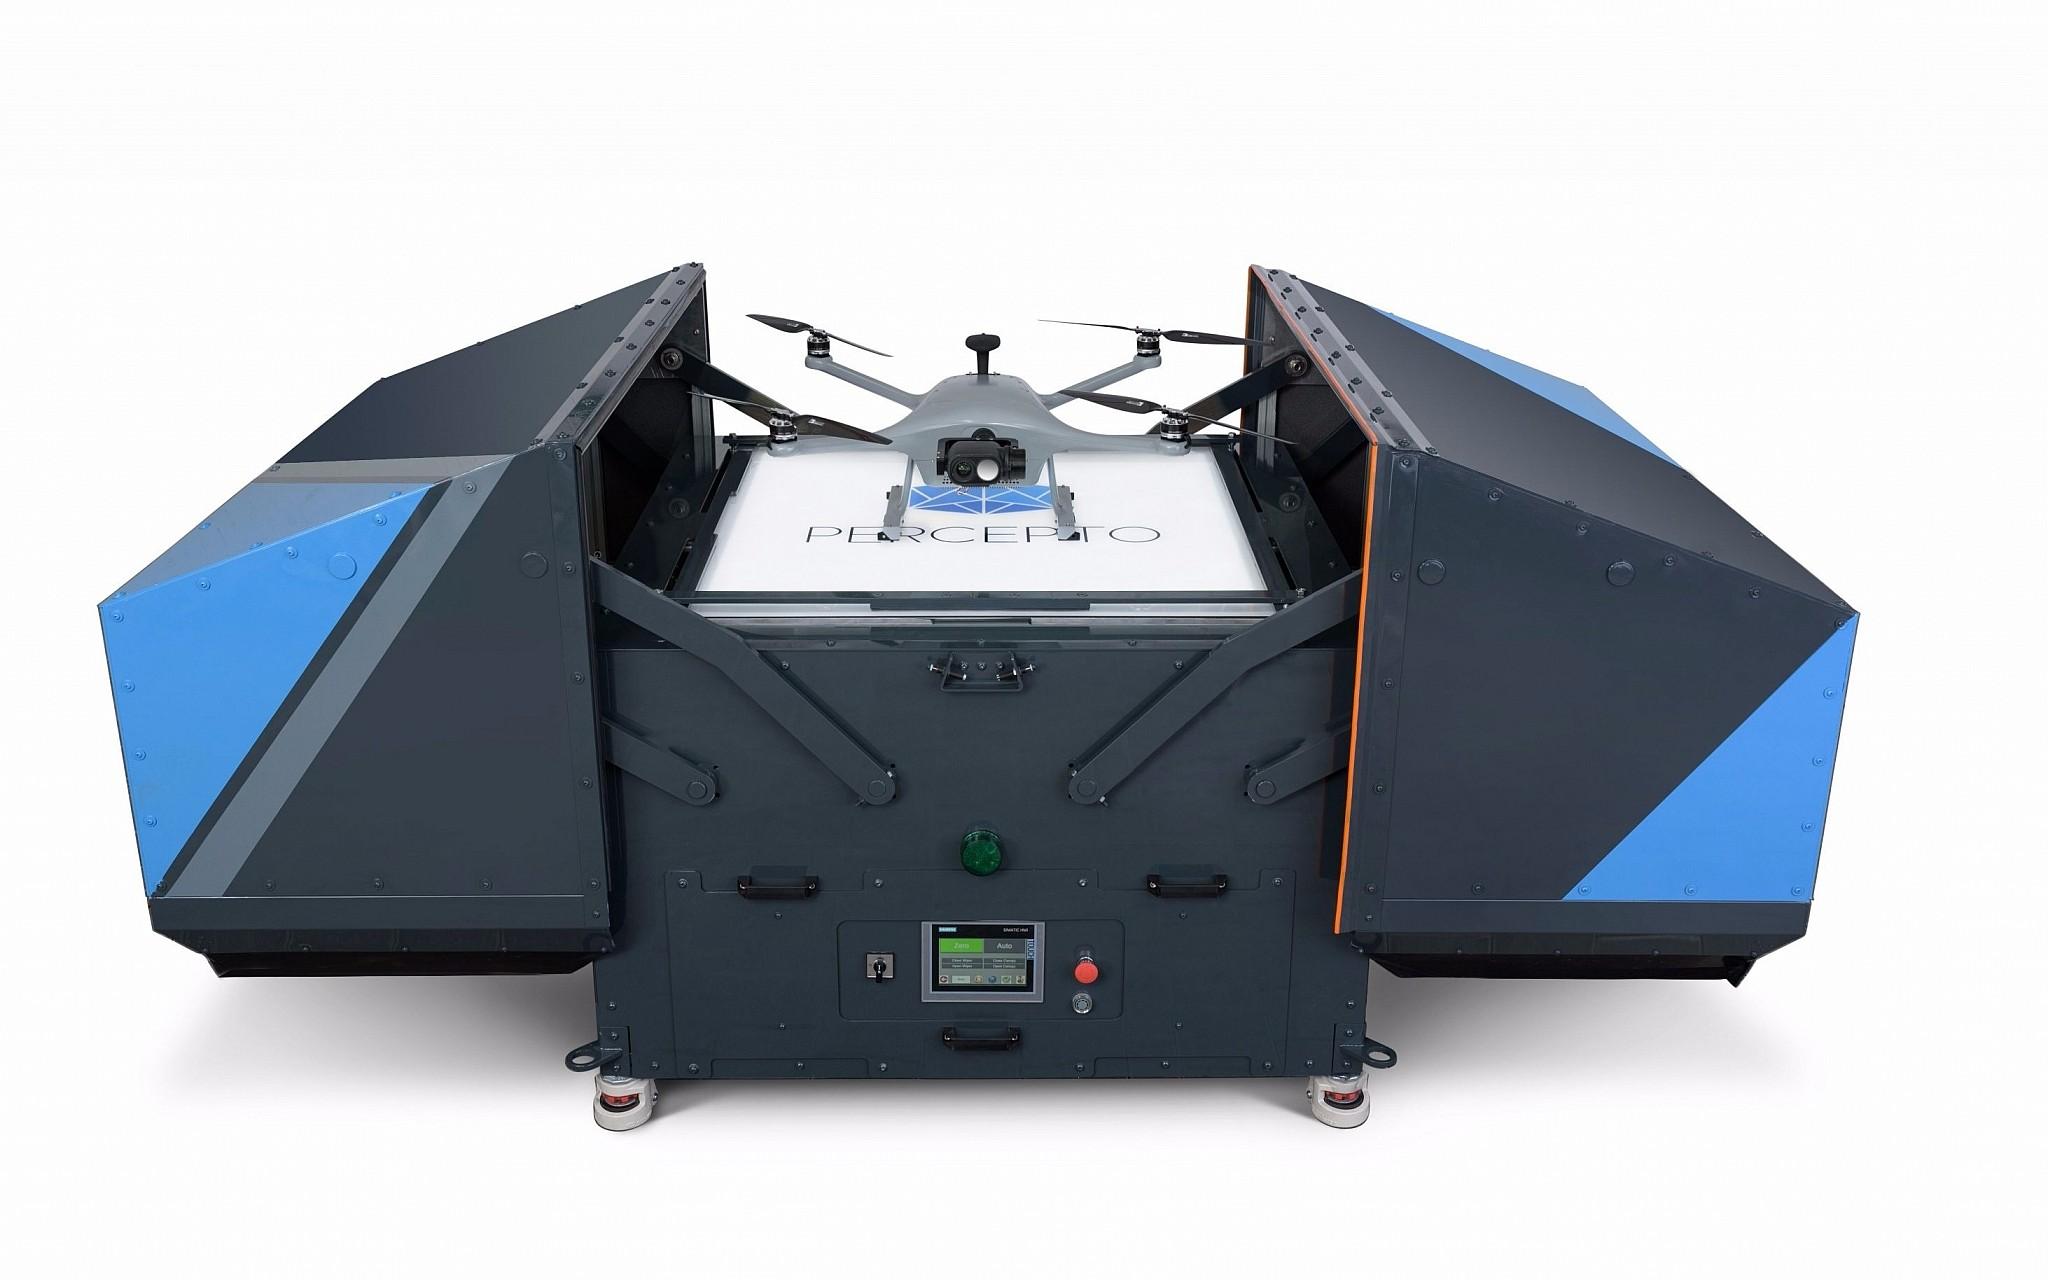 Imperative Israeli Startup Sires Autonomous Drone For Harsh